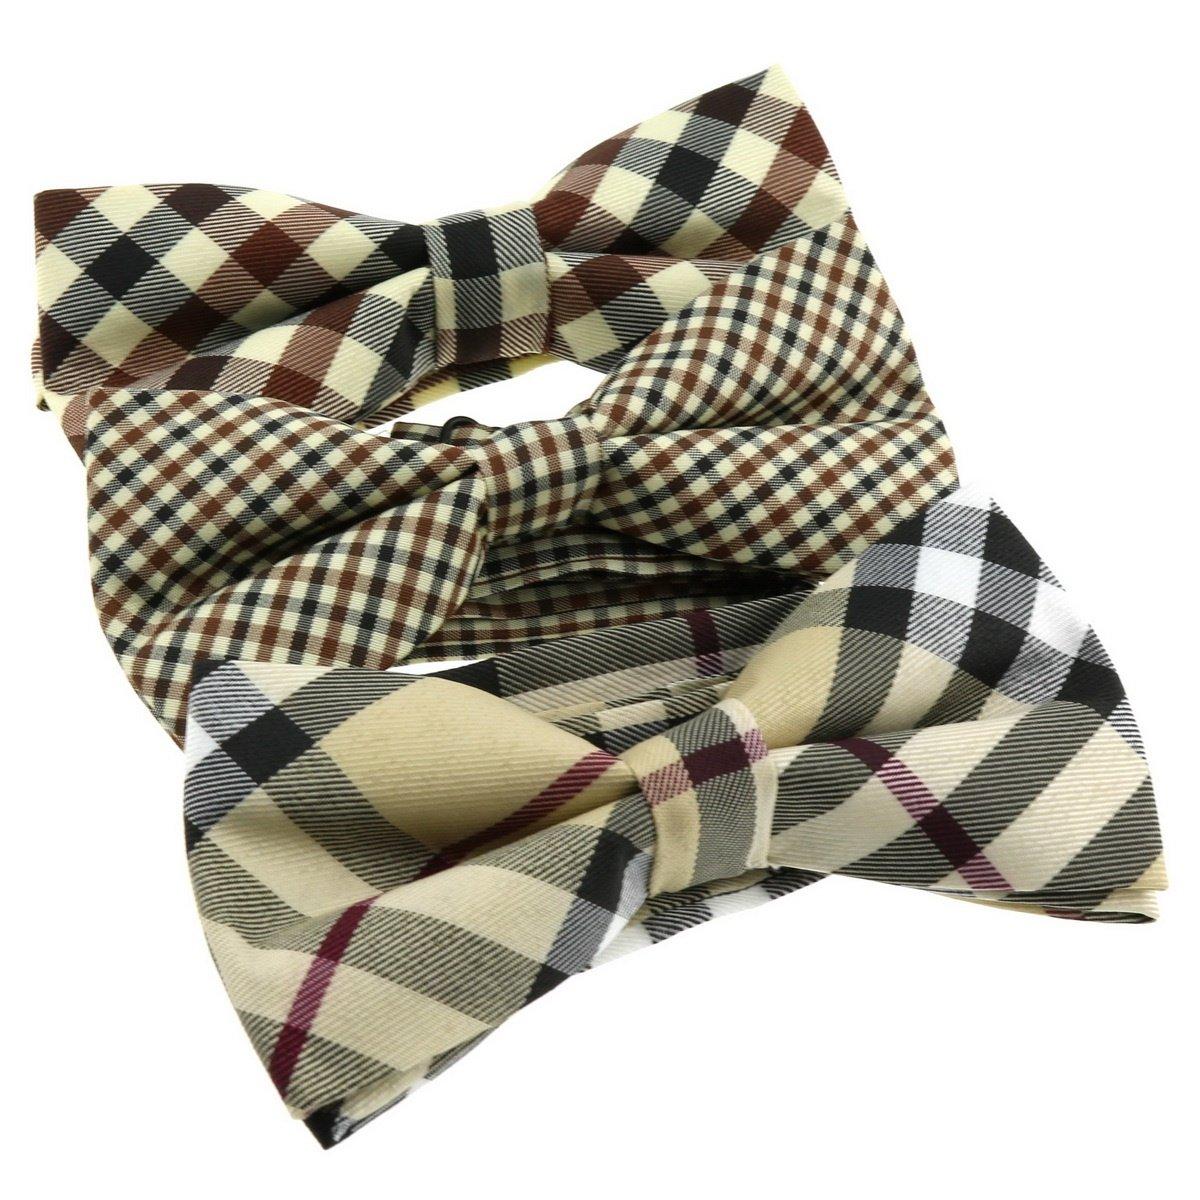 Ukerdo Beige Color Special Design Bow Tie Series Mixed Lot Adjustable Neckwear - 3pcs MixBowtie-049